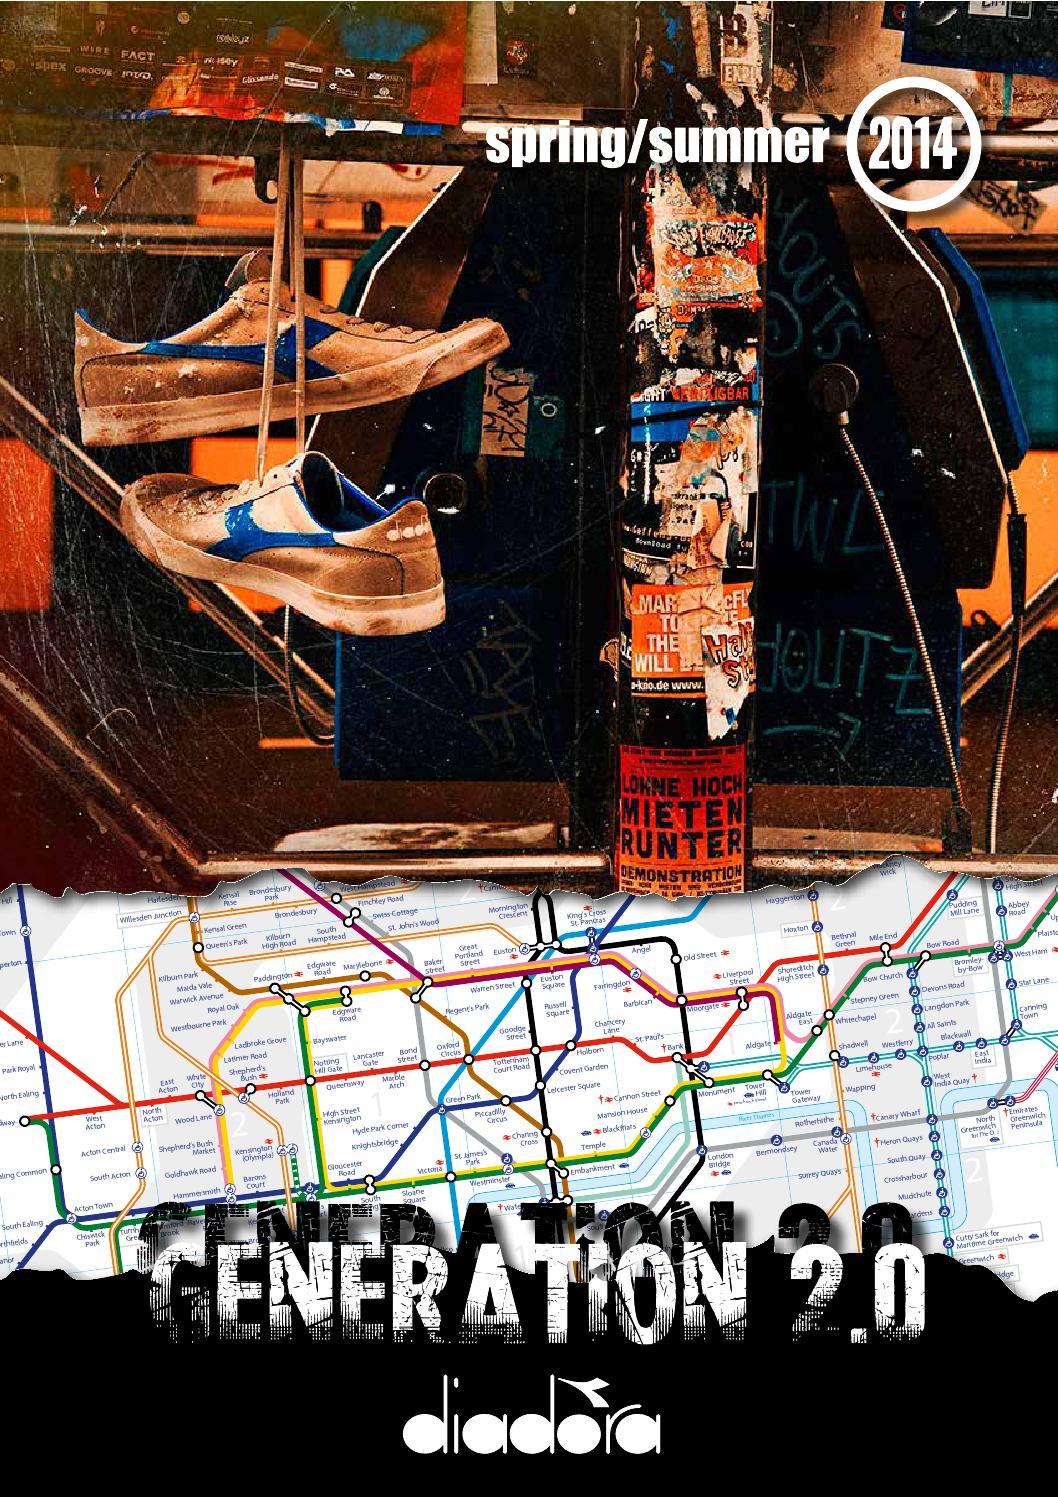 Look book diadora generation 2 0 ss14 by Asap Communication